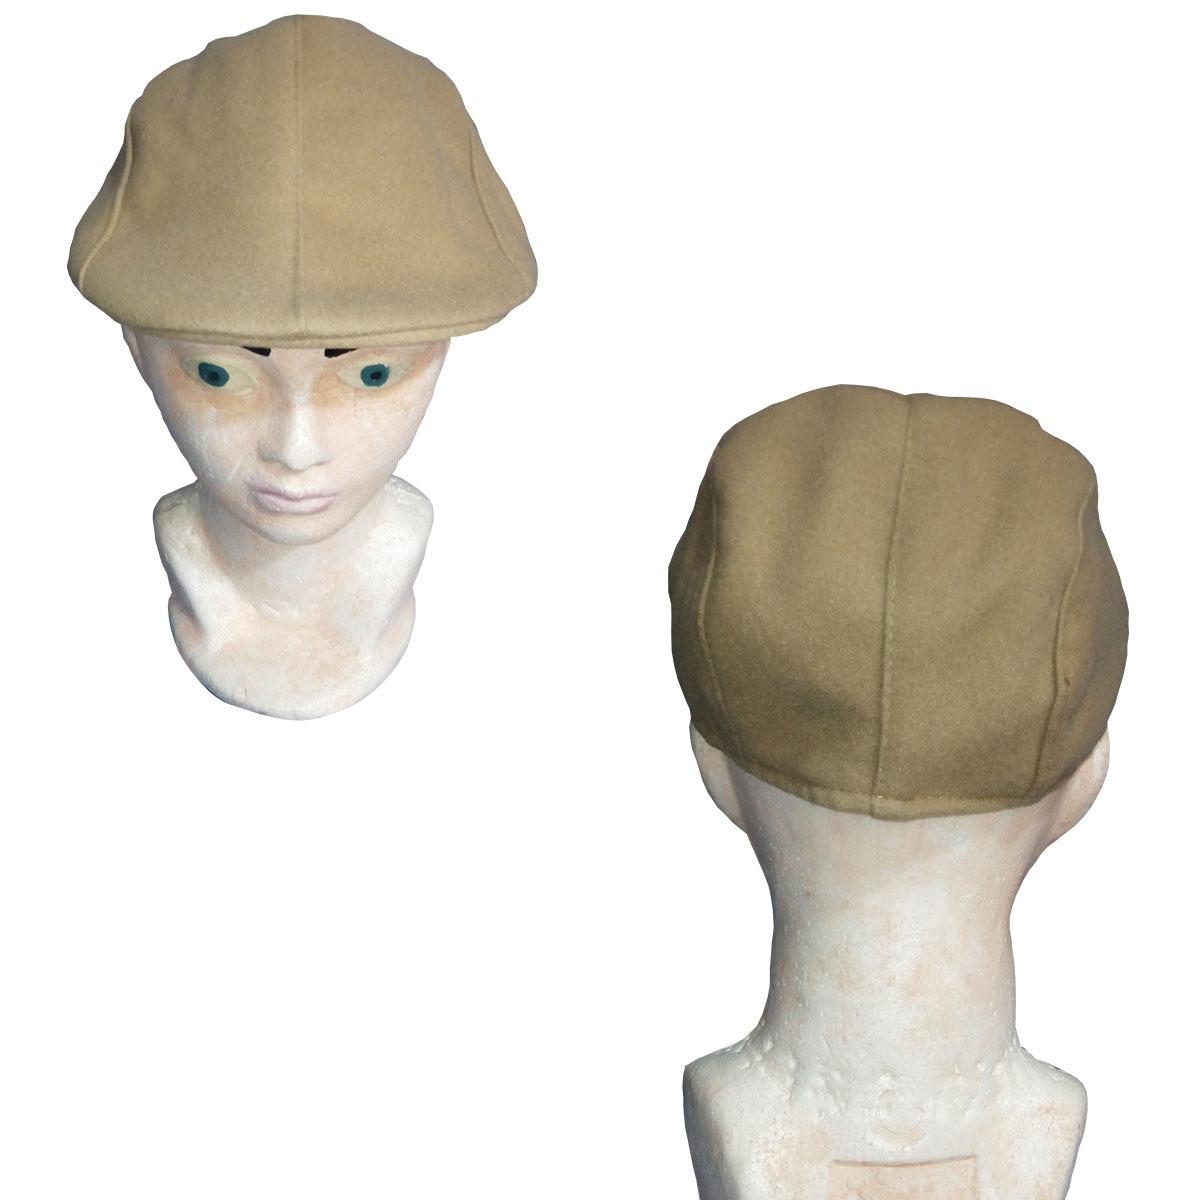 boina gorra para hombre lote de 50 piezas diferentes modelos. Cargando zoom. 3b6cc09a94d